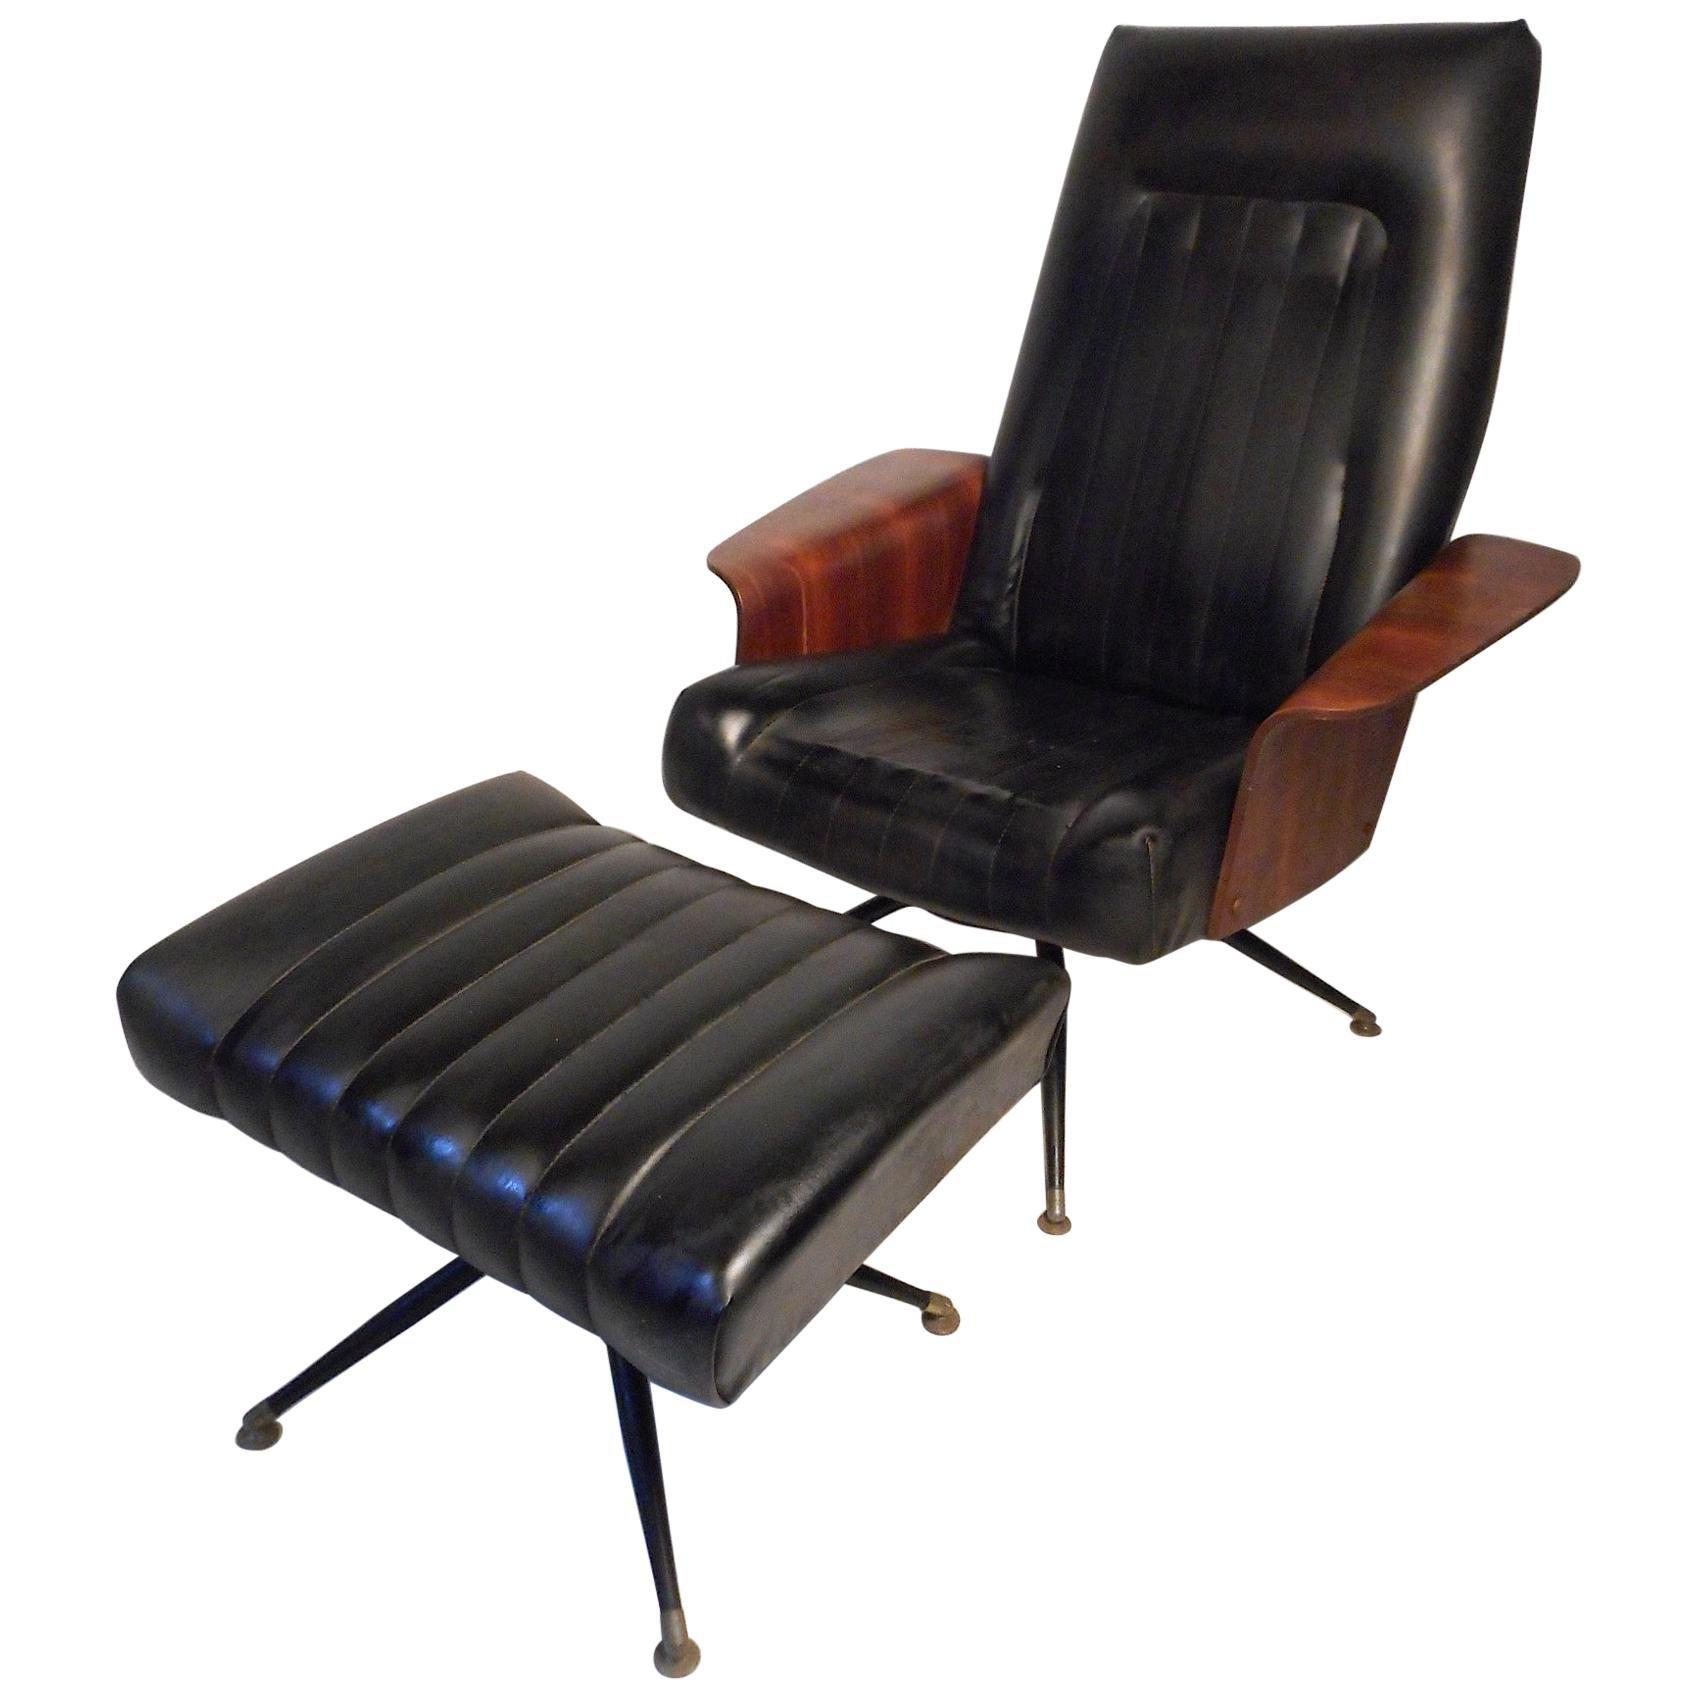 Tremendous Mid Century Modern Tufted Vinyl Lounge Chair And Ottoman Creativecarmelina Interior Chair Design Creativecarmelinacom